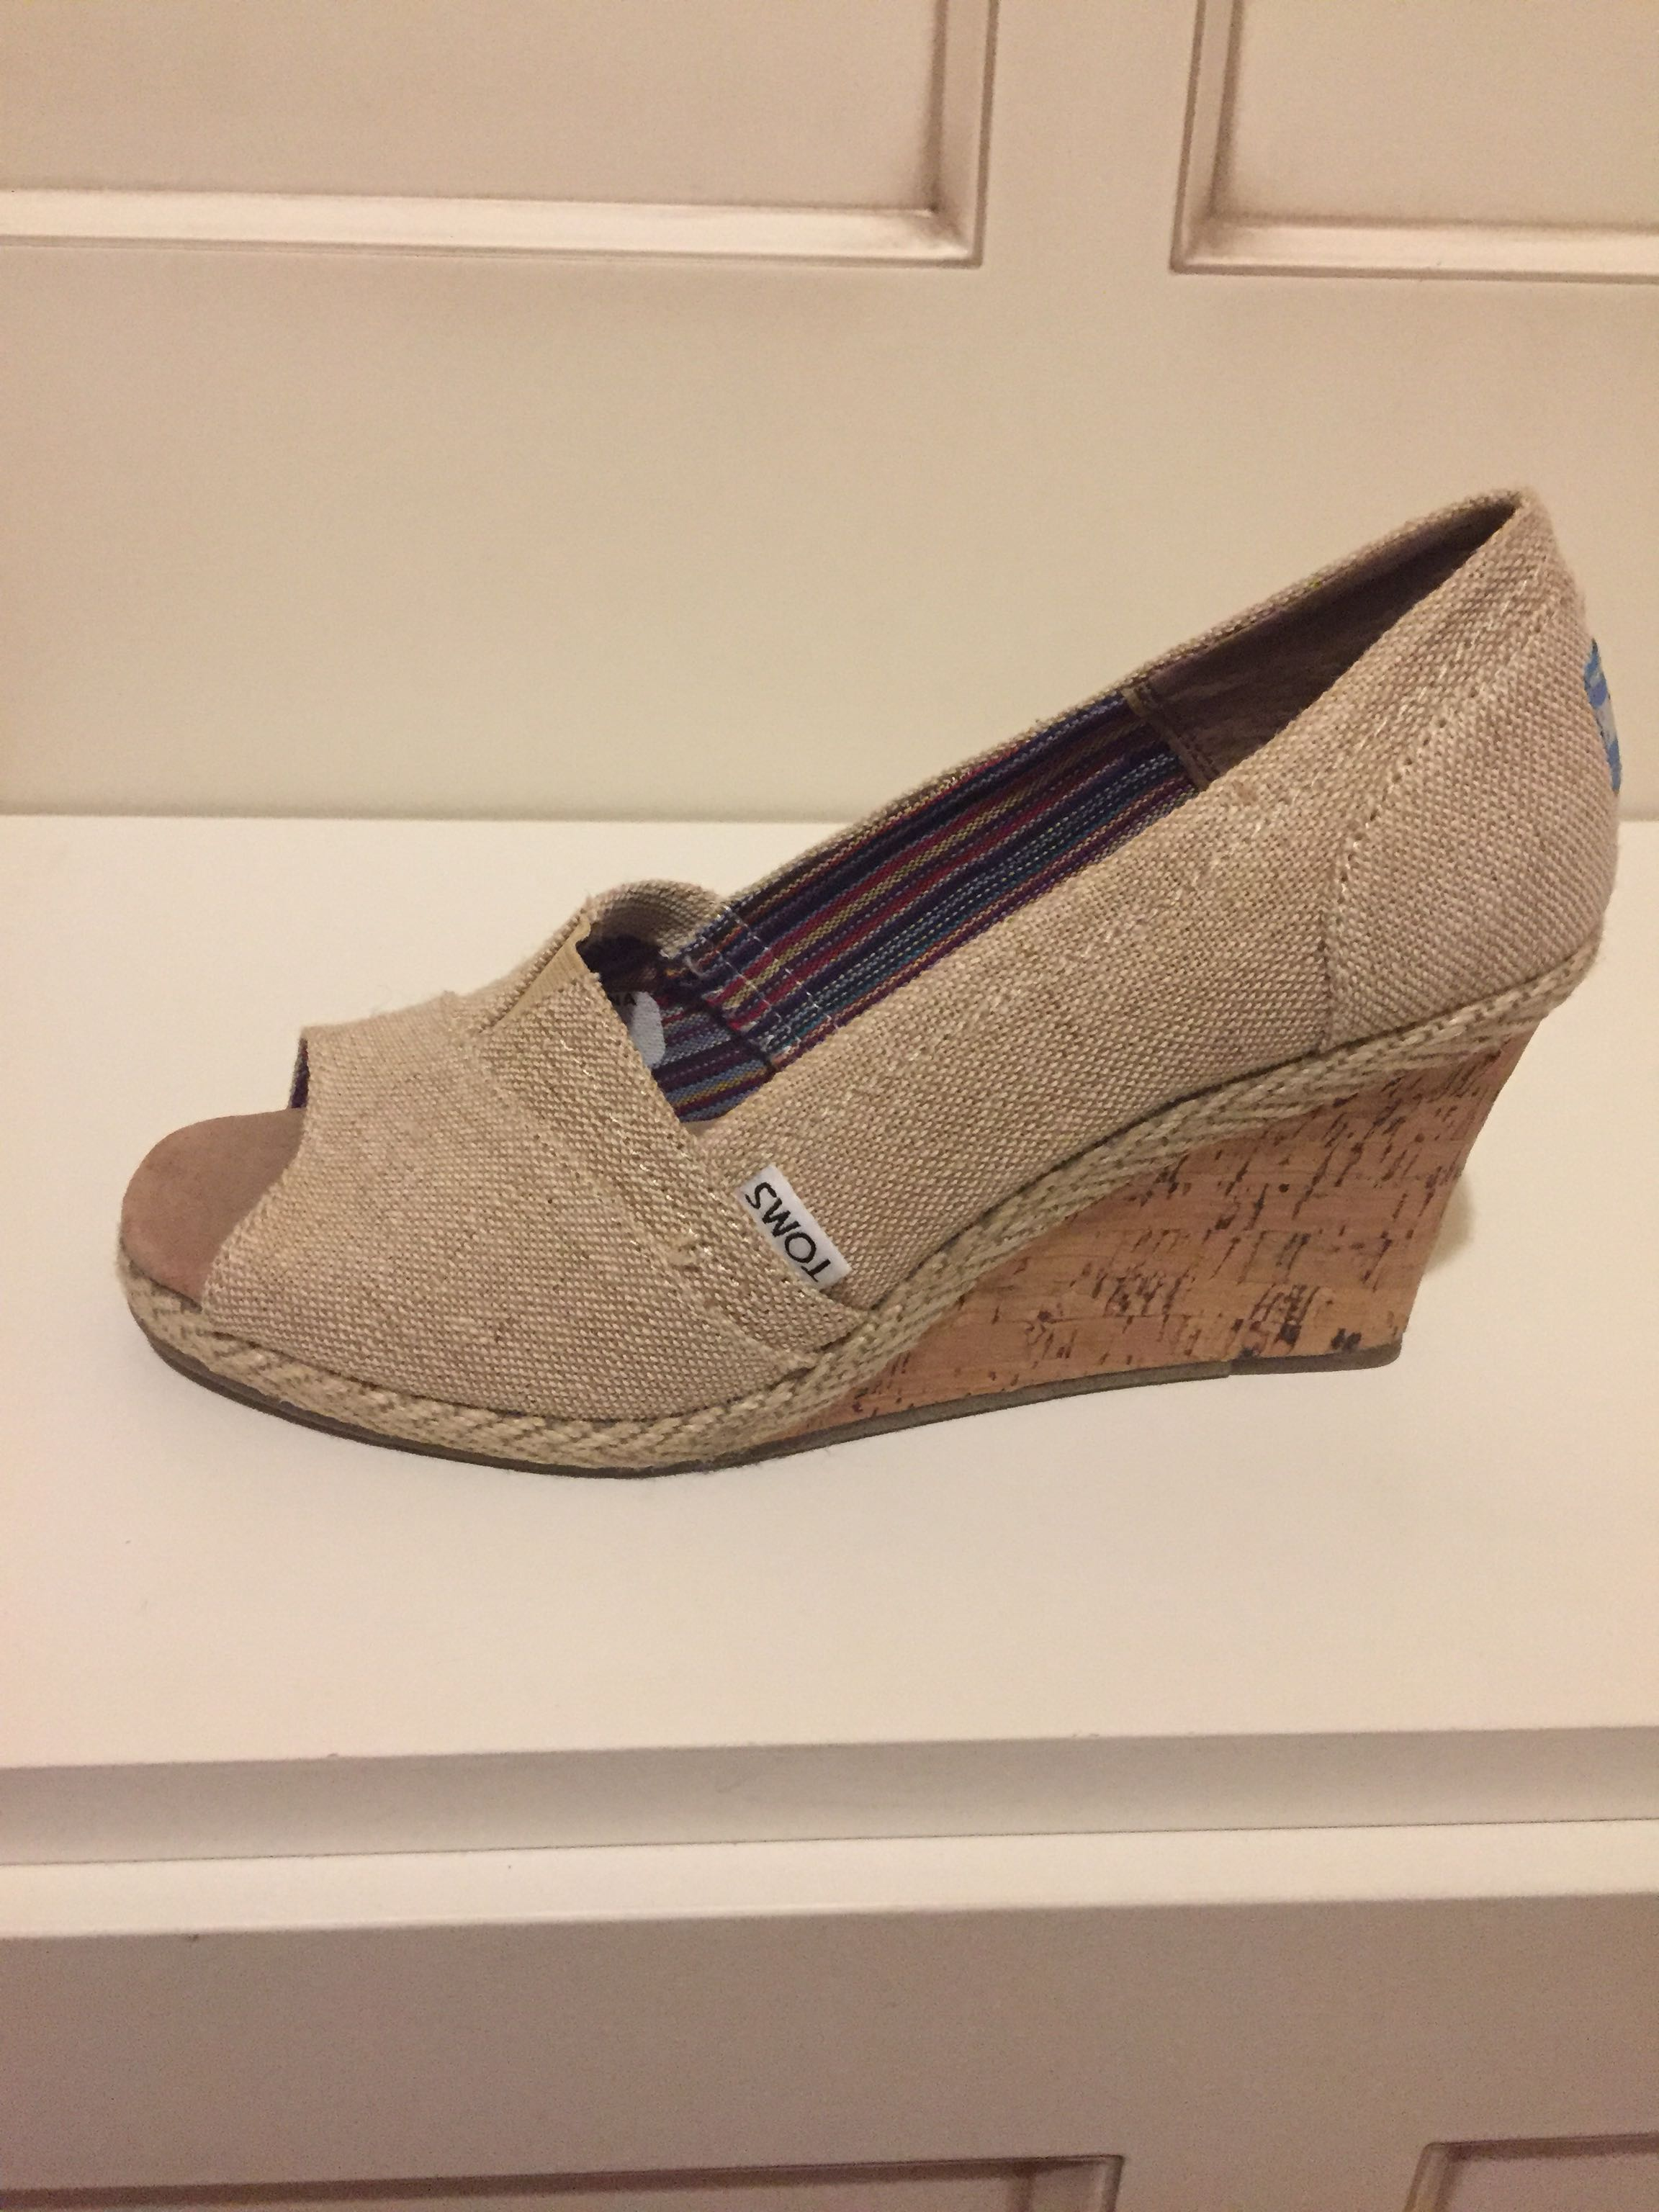 New...Toms open toe shoe